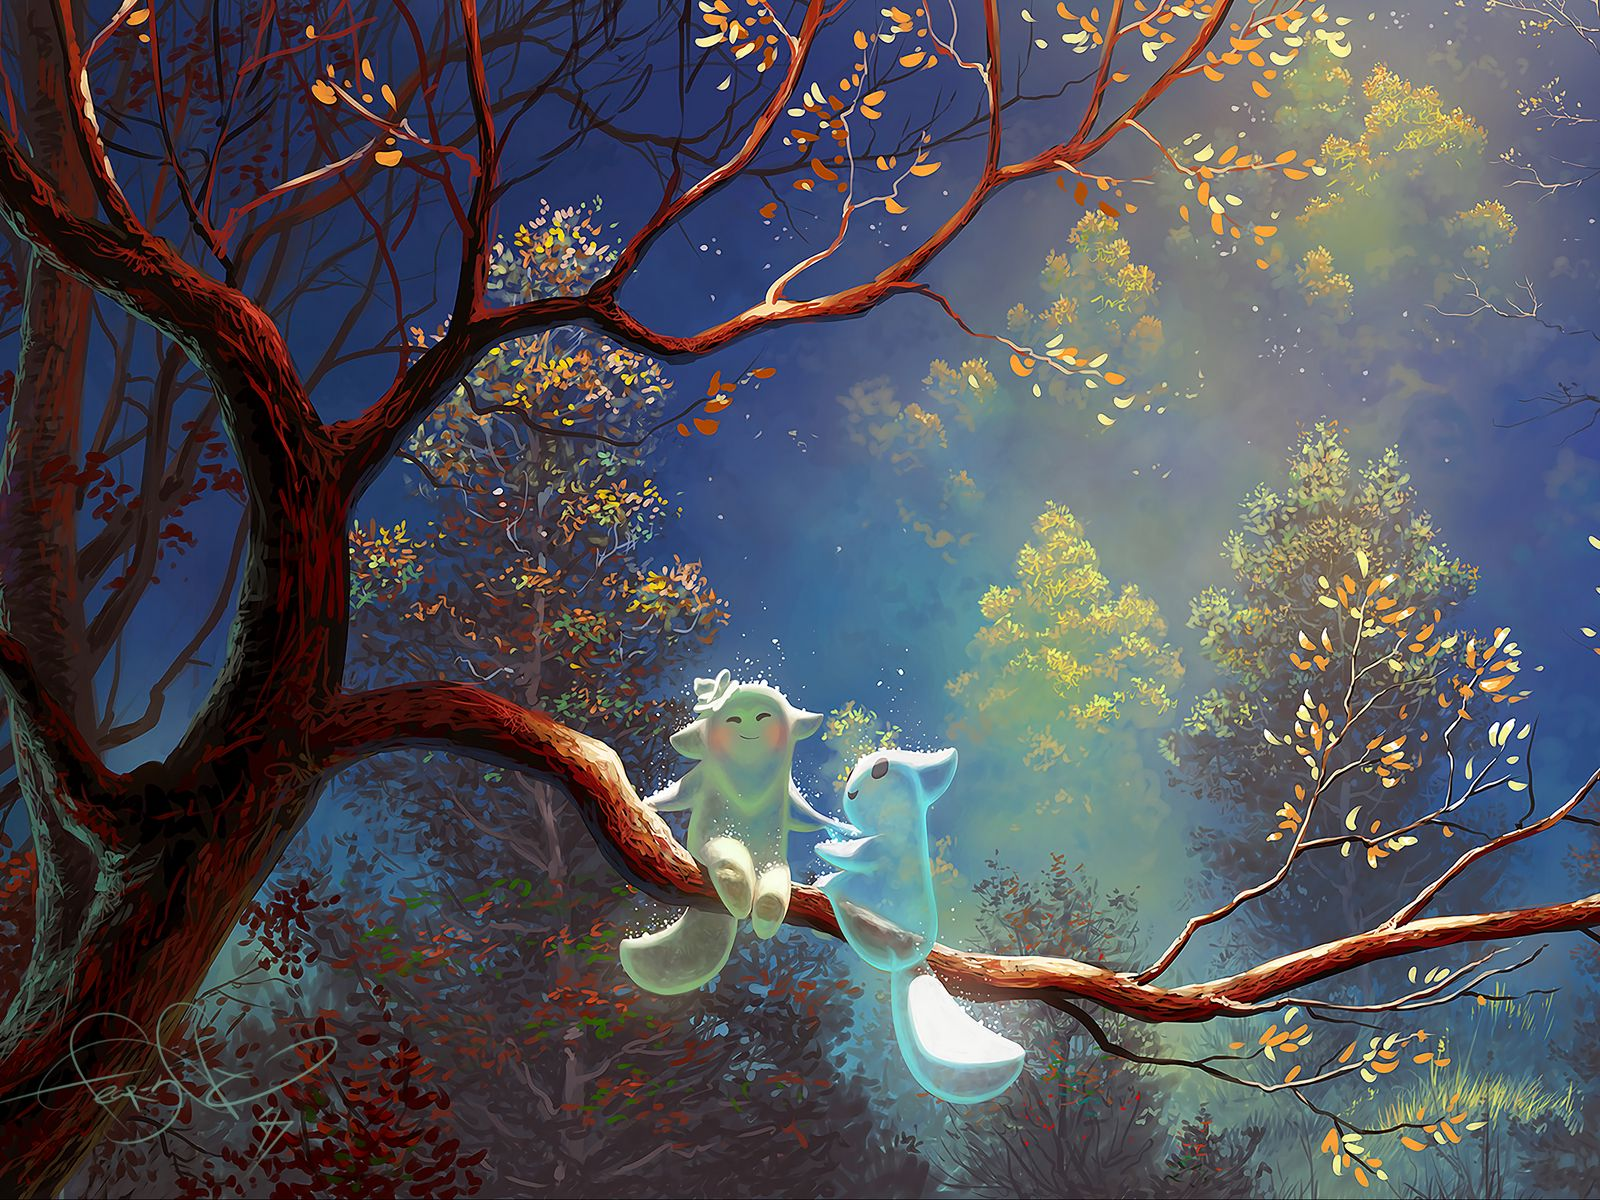 1600x1200 Wallpaper animals, tree, branch, magic, art, fantasy